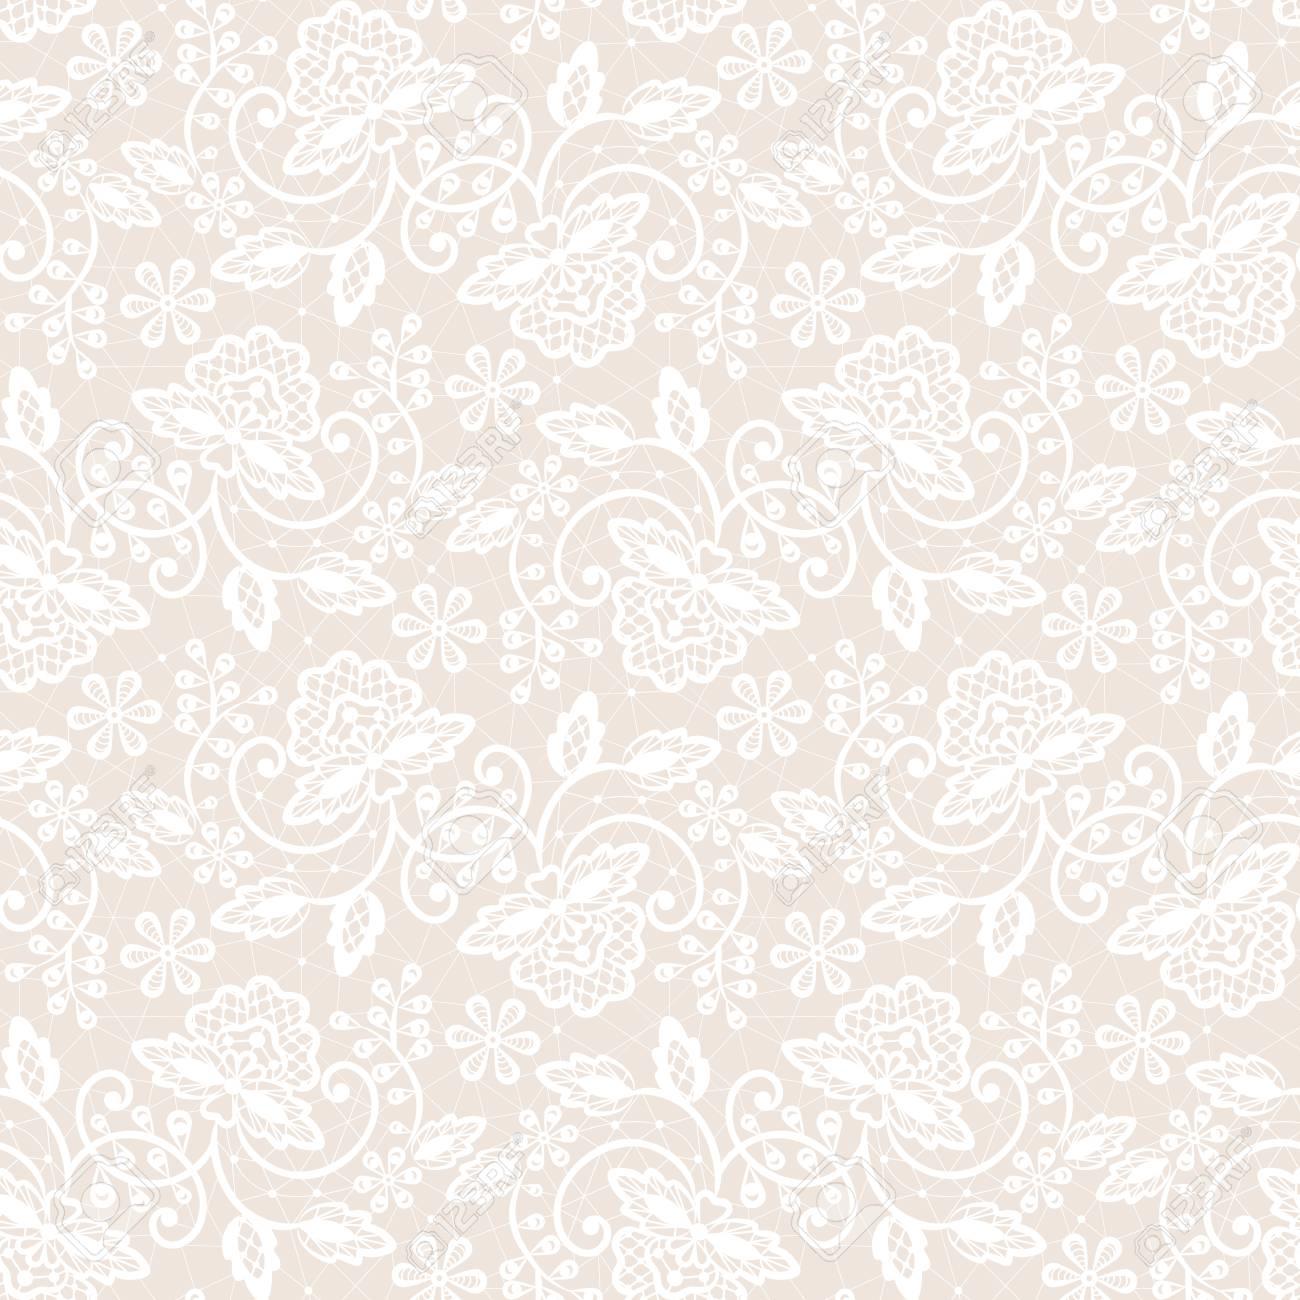 Seamless white lace - 87766433